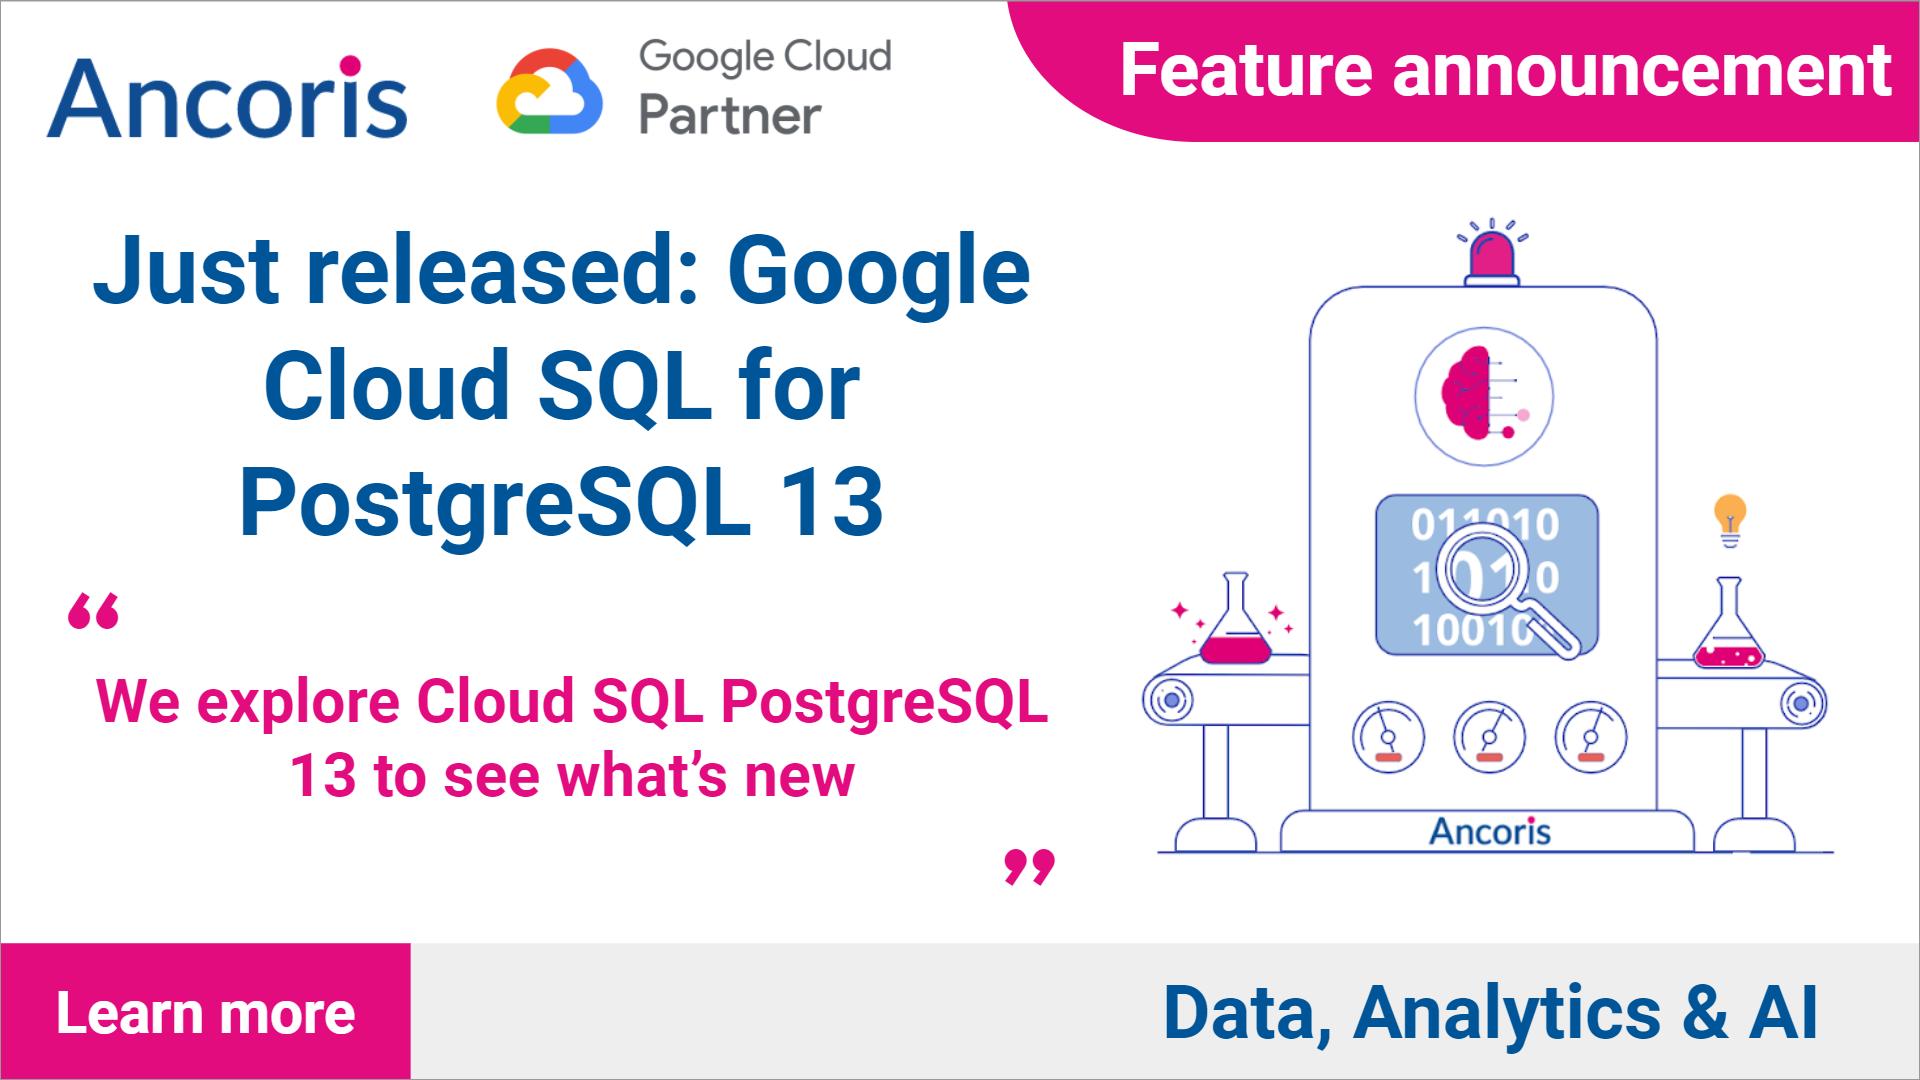 Released: Cloud SQL for PostgreSQL 13